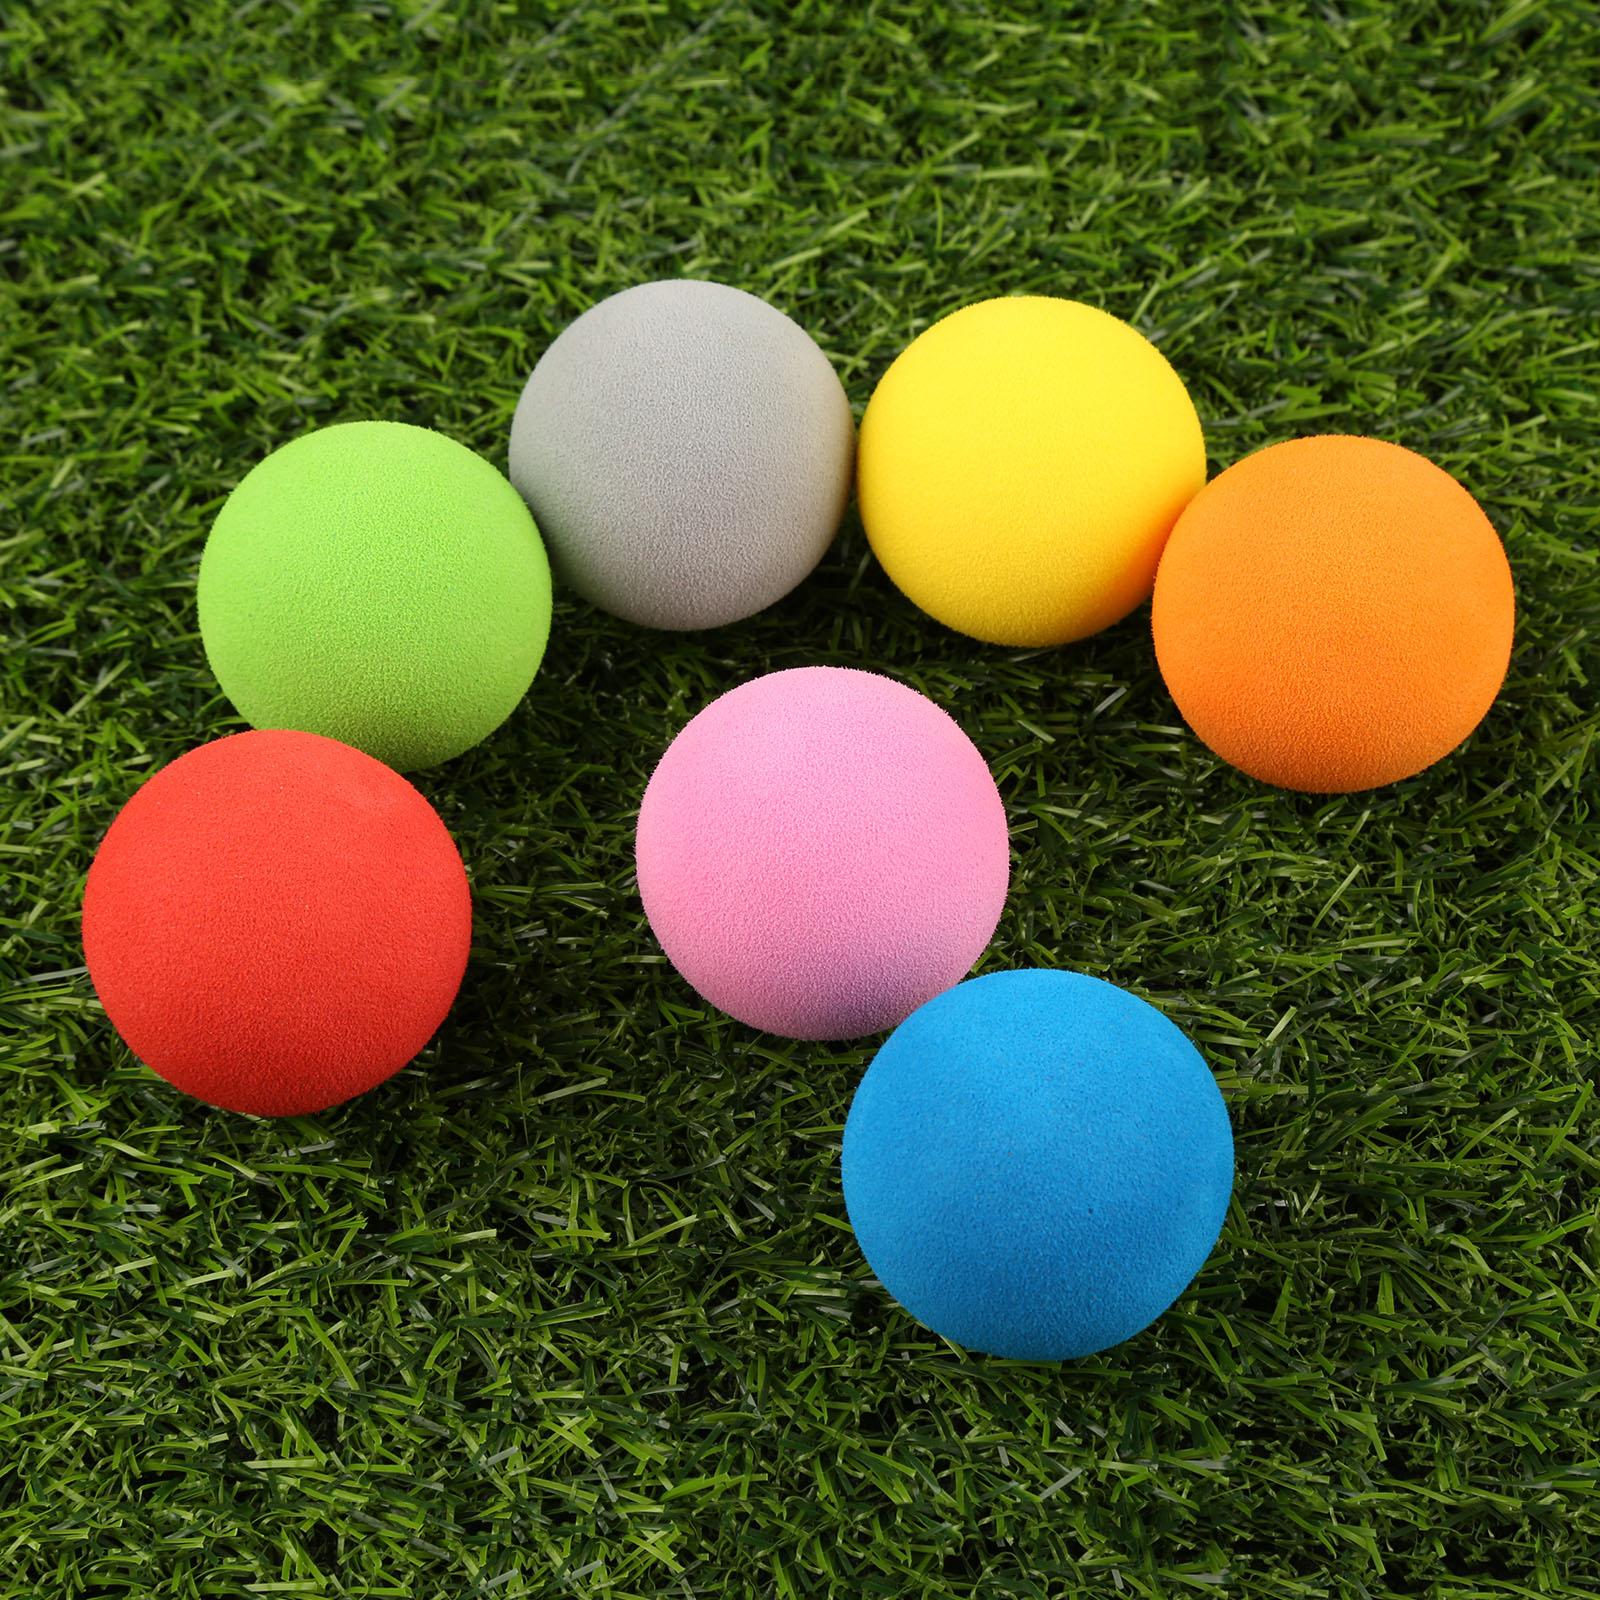 10Pcs/Lot EVA Foam Golf Balls Soft Sponge Balls for Outdoor Golf Swing Practice Balls for Golf/Tennis Training Solid 7 Colors 1